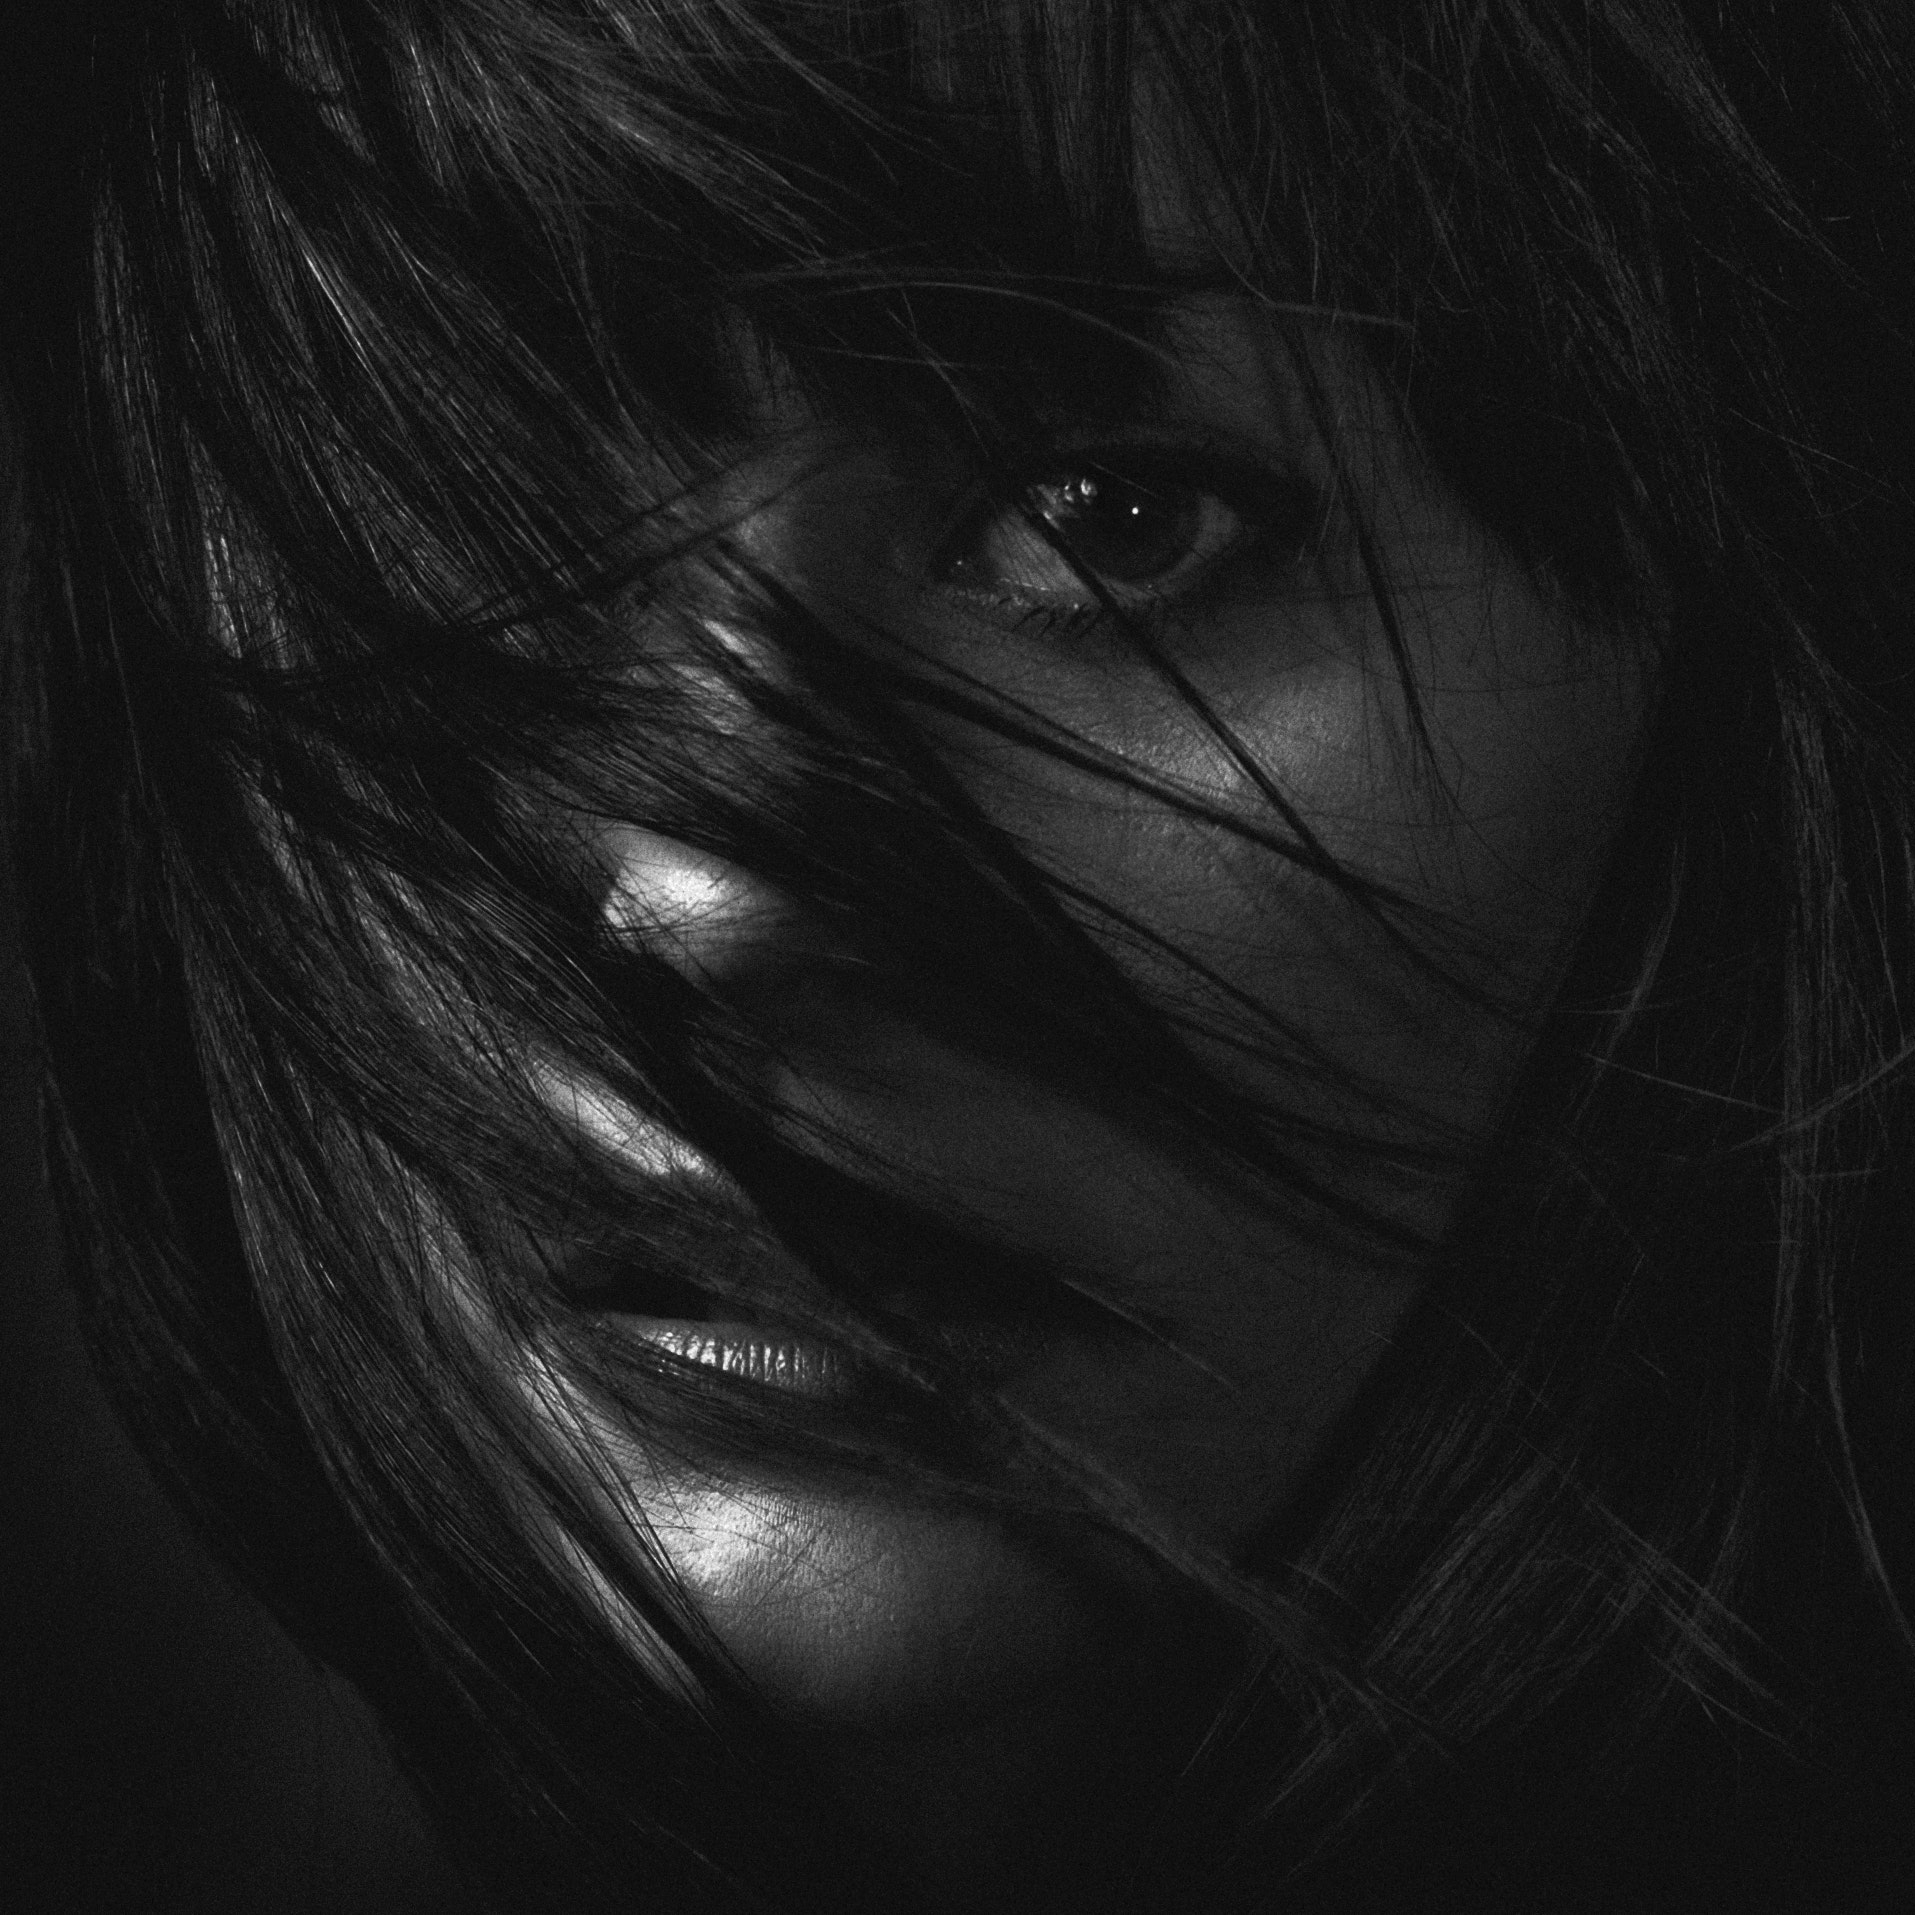 beautiful-beauty-black-and-white-1022166.jpg